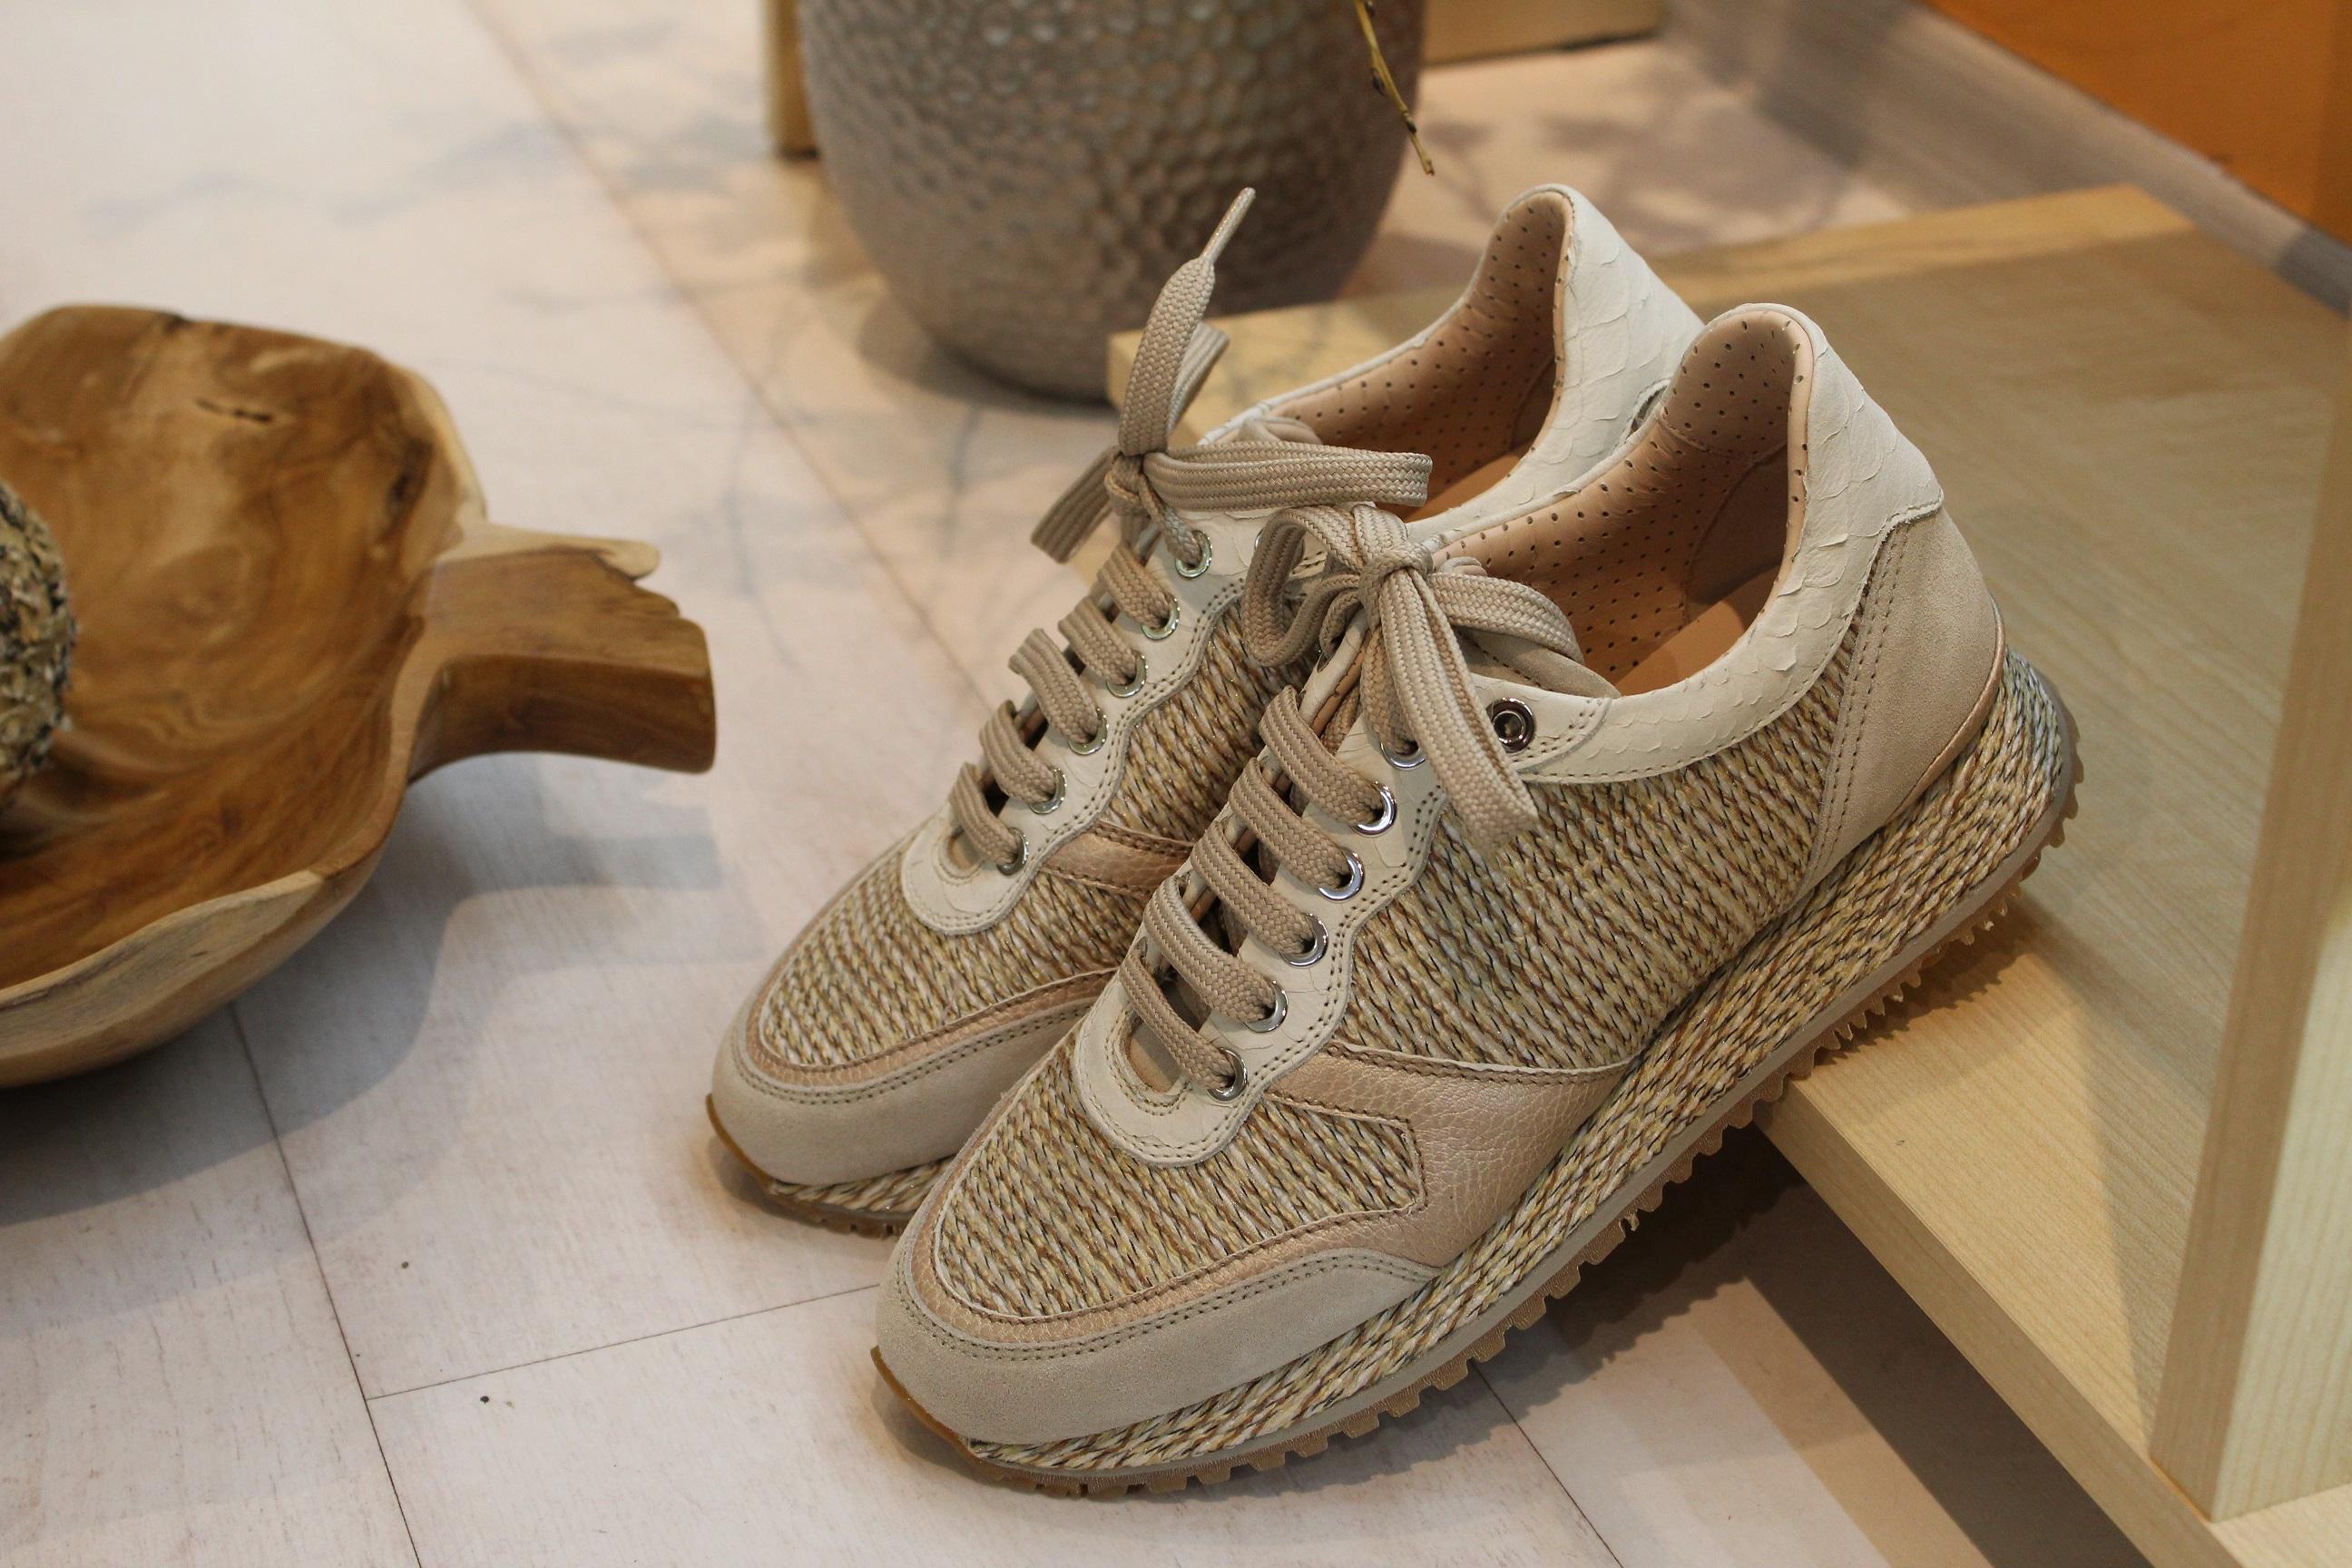 gallery_1_novaja-kollekcija-ispanskoj-obuvi-pertini-6